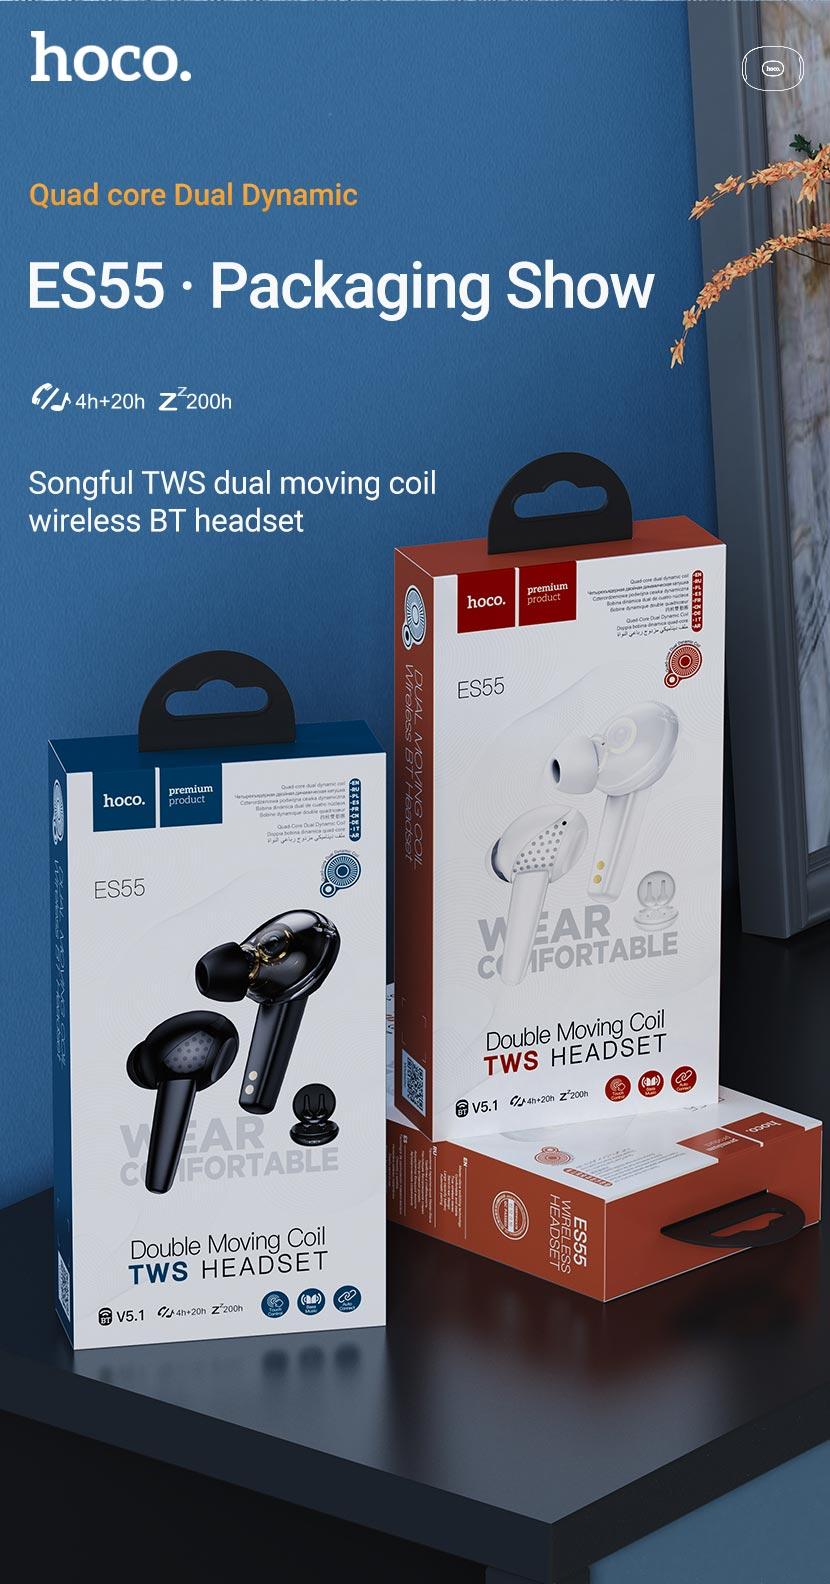 hoco news es55 songful tws dual moving coil wireless bt headset package en